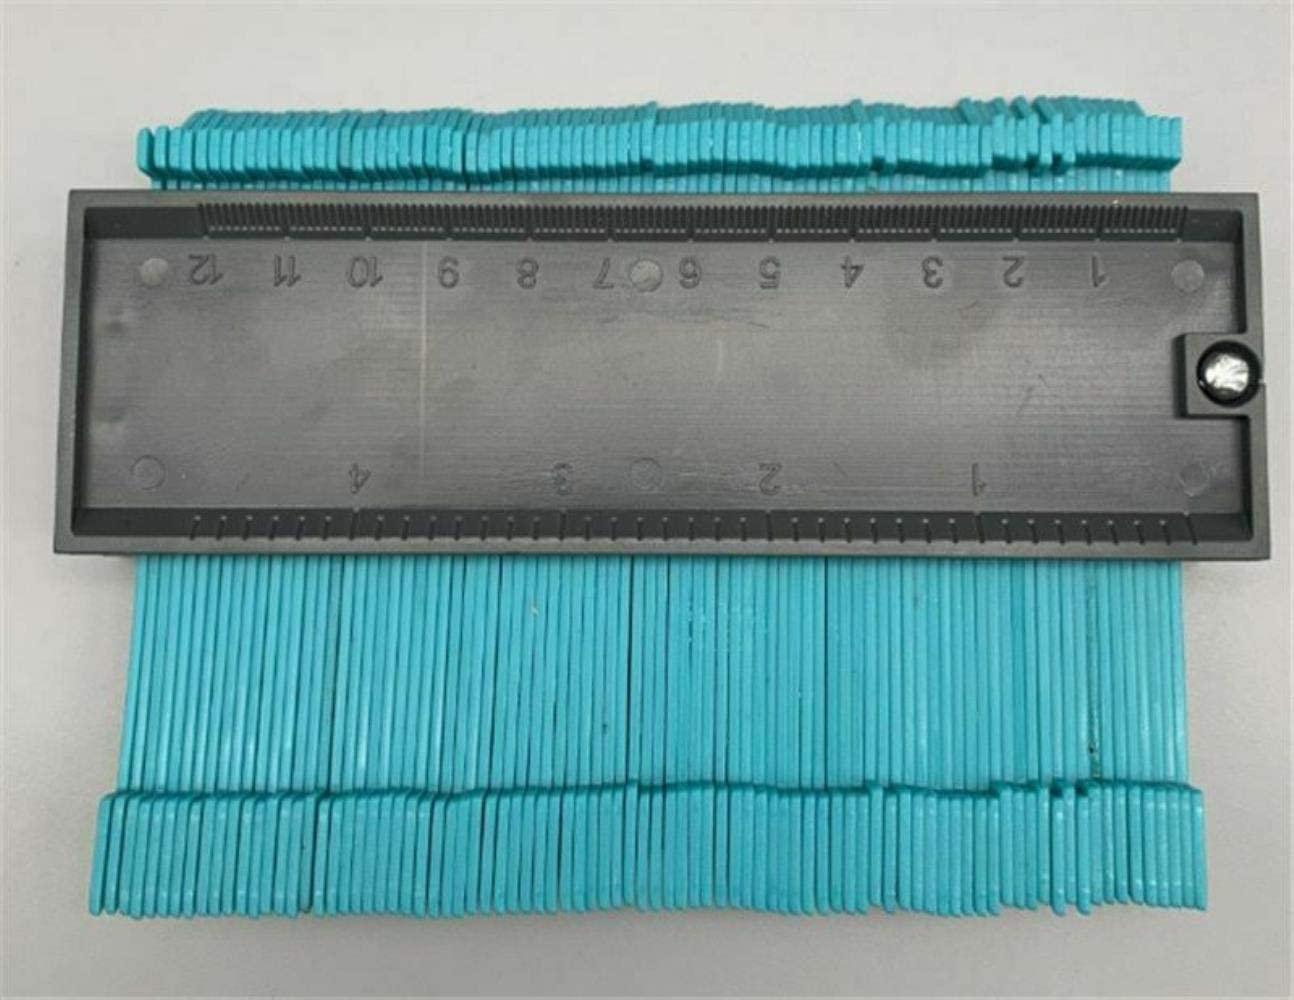 Contour Gauge,Wood Marking Tool Tiling Laminate Gauge Contour Profile Copy Gauge Duplicator,B